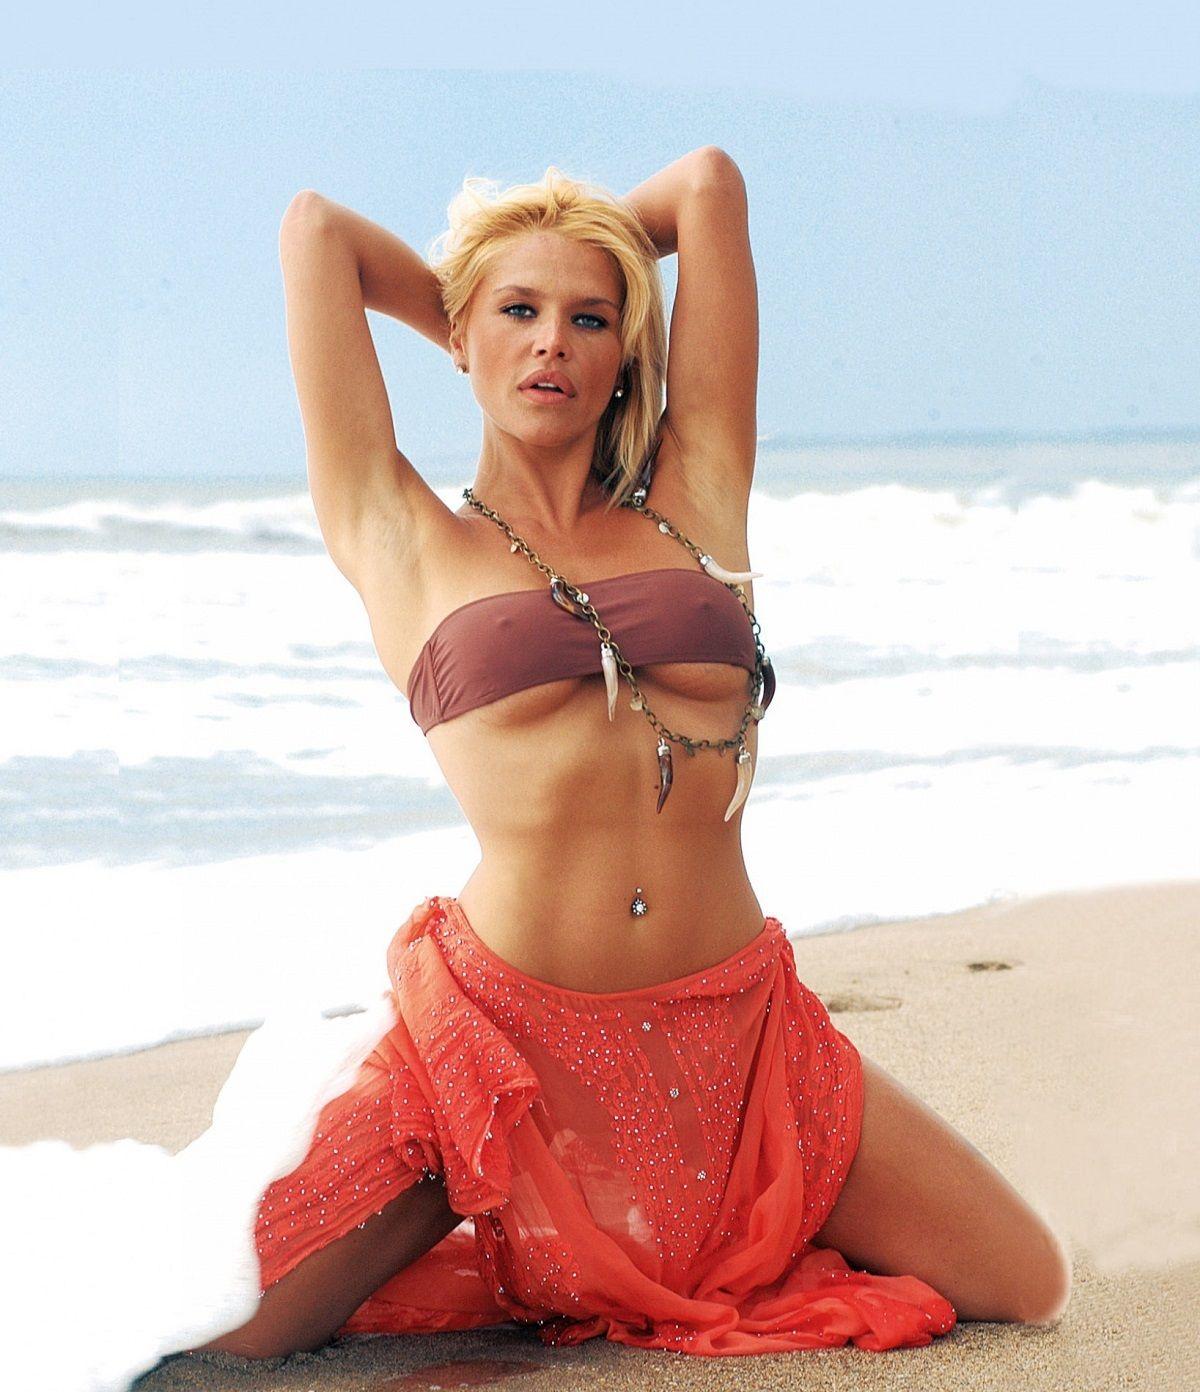 El topless de Nazarena Vélez